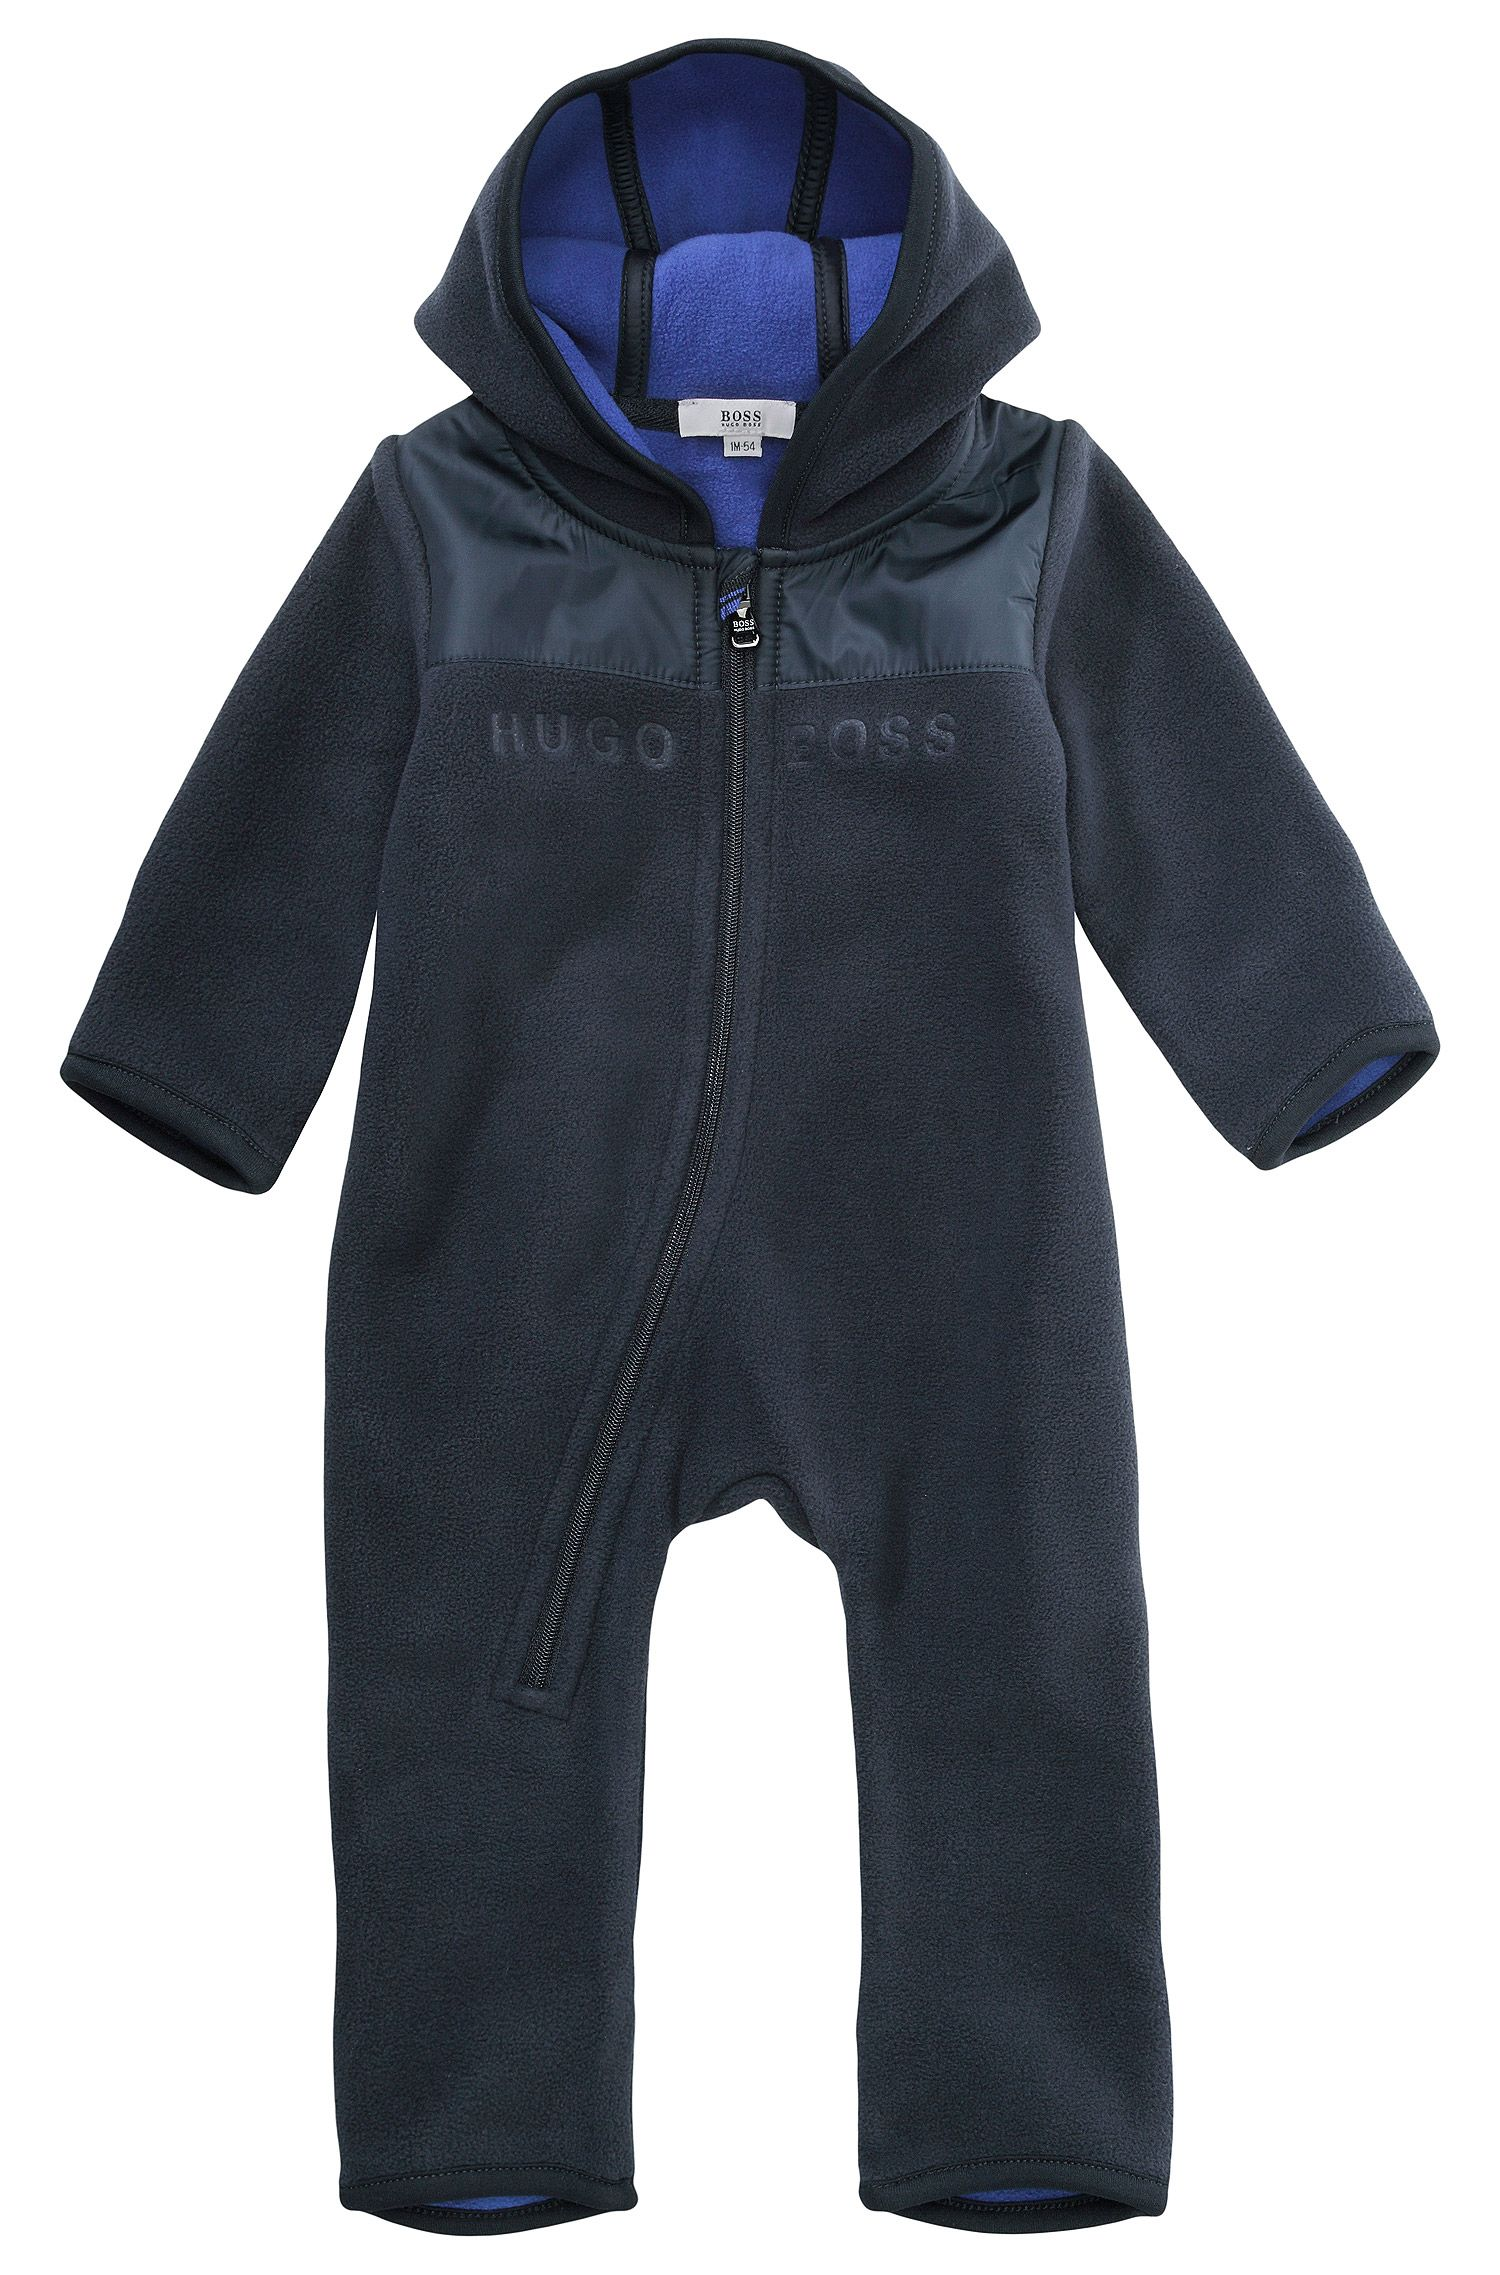 Grenouillère pour enfant «J96035»